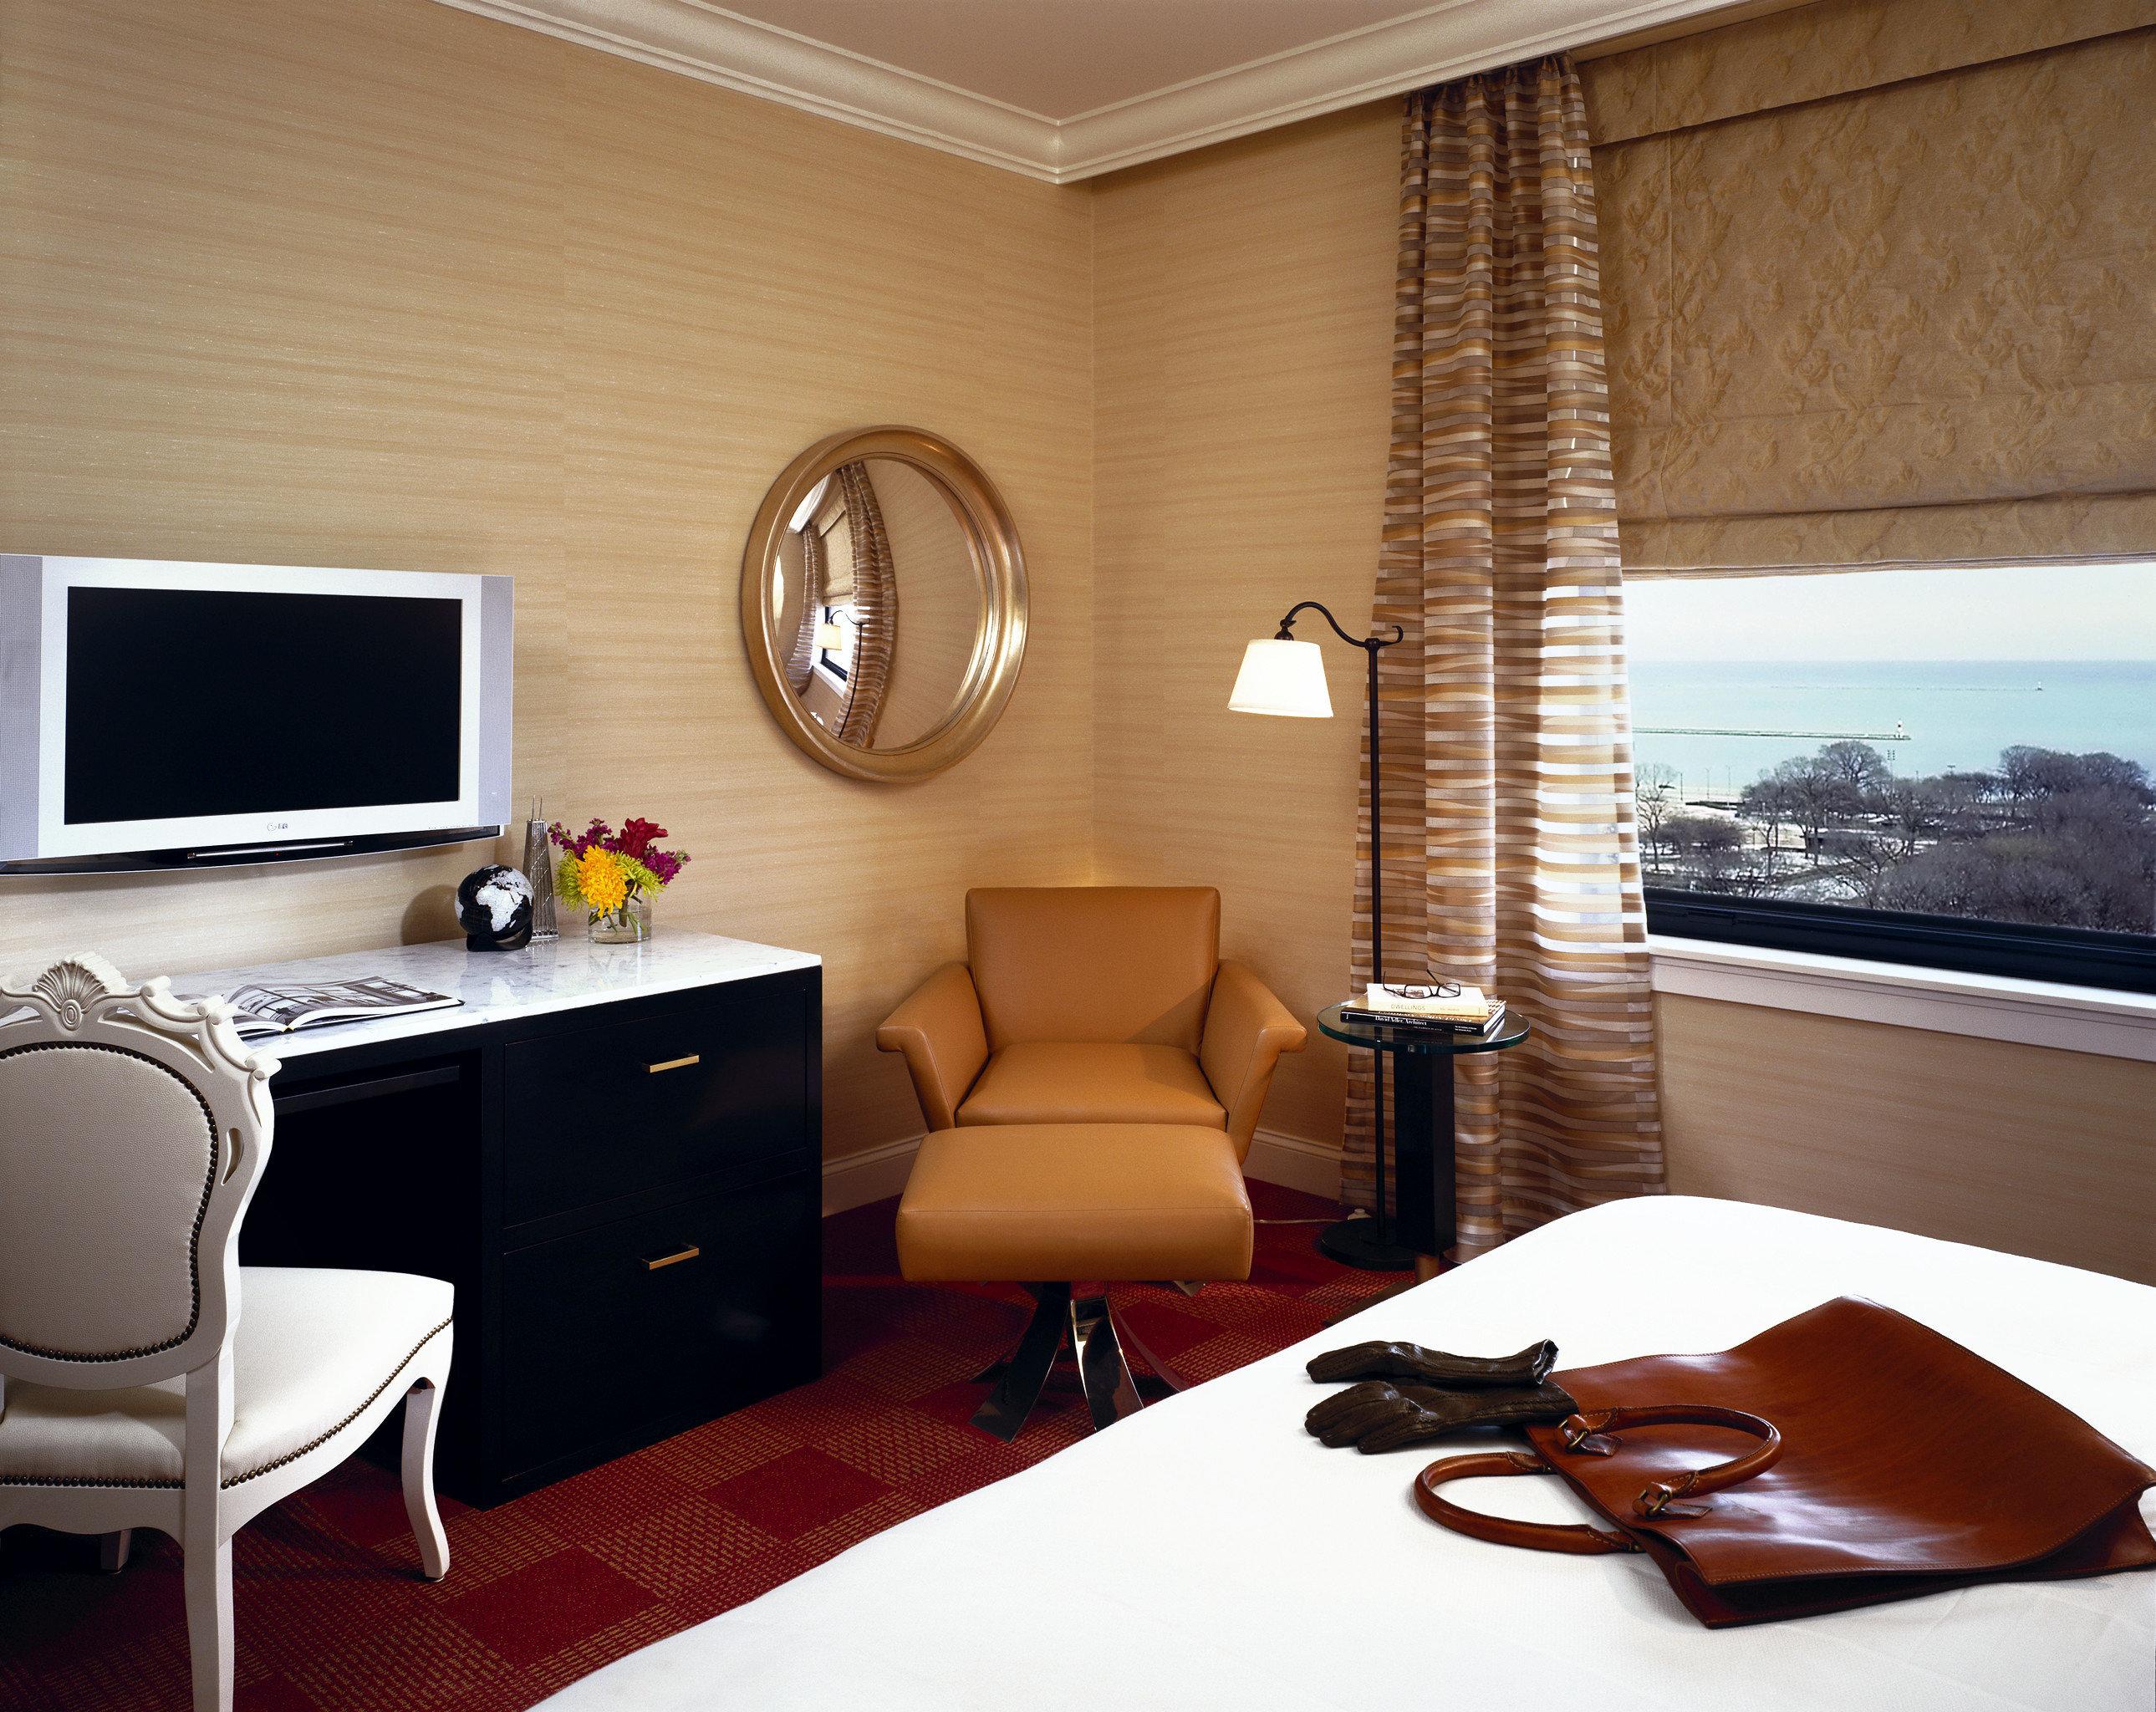 Bedroom City Elegant Hip Luxury Modern Scenic views Suite property living room home cottage condominium